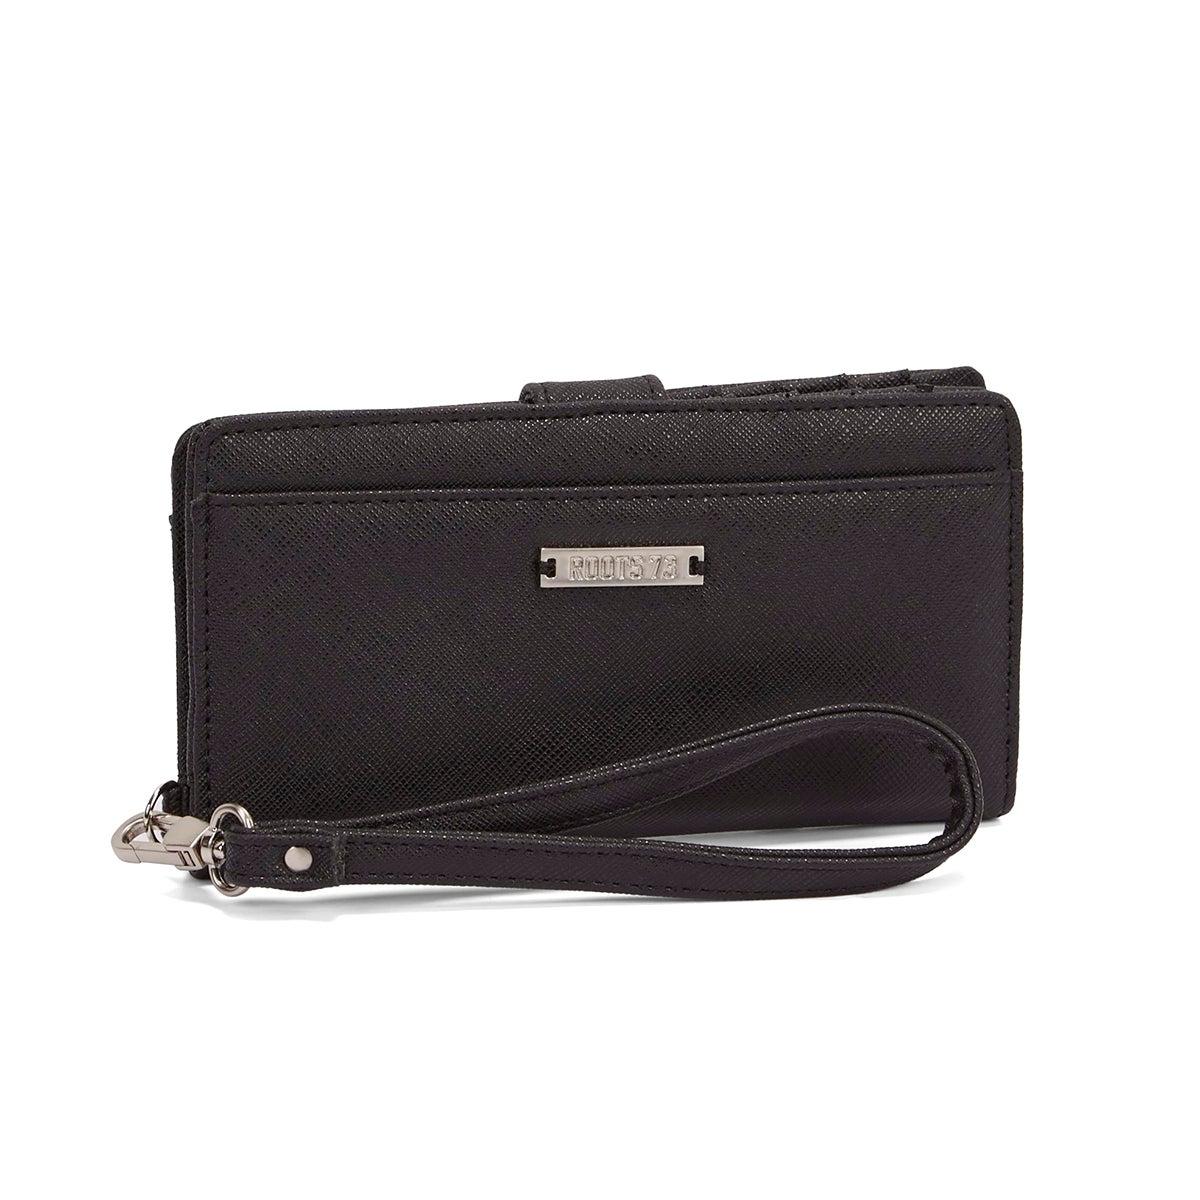 Lds Graphite black top buckle wallet